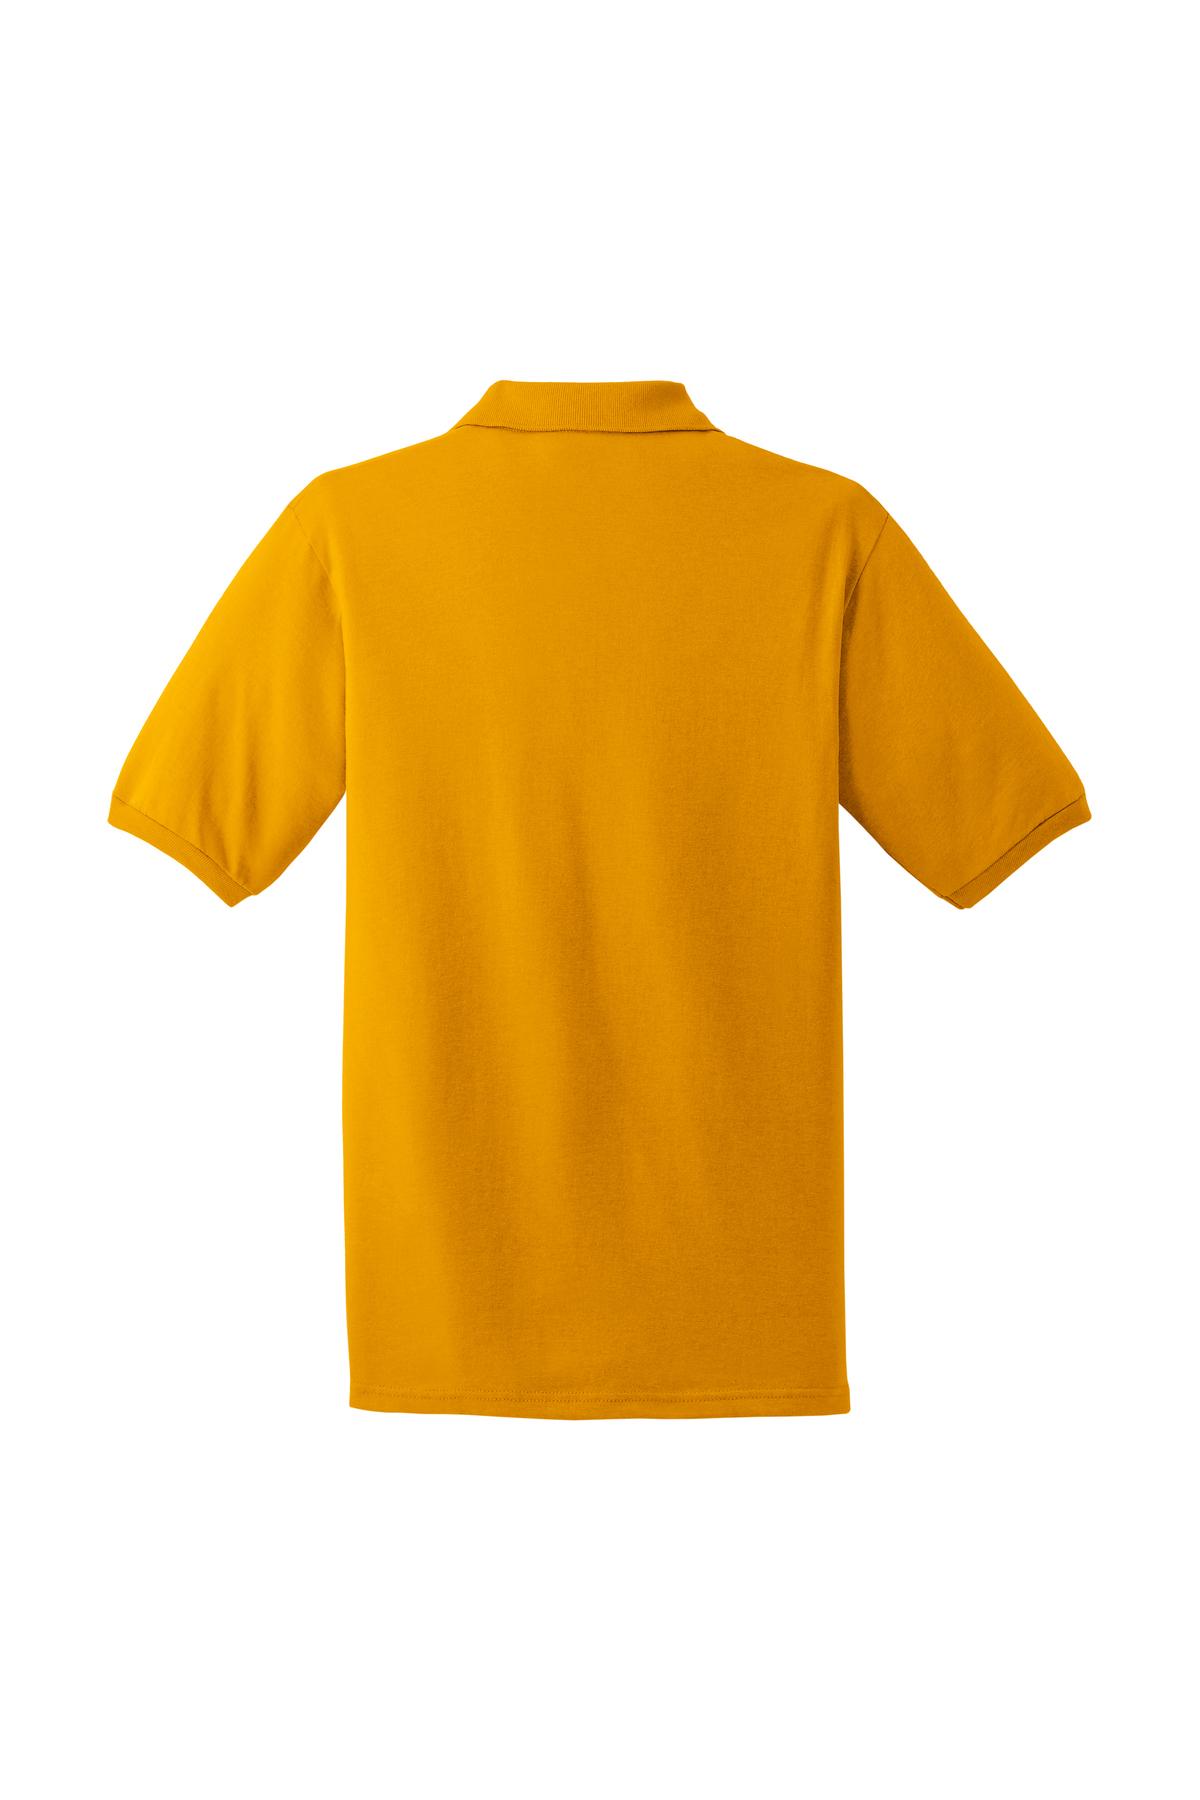 Royal Youth SpotShield Jersey Sport Shirt/Ü